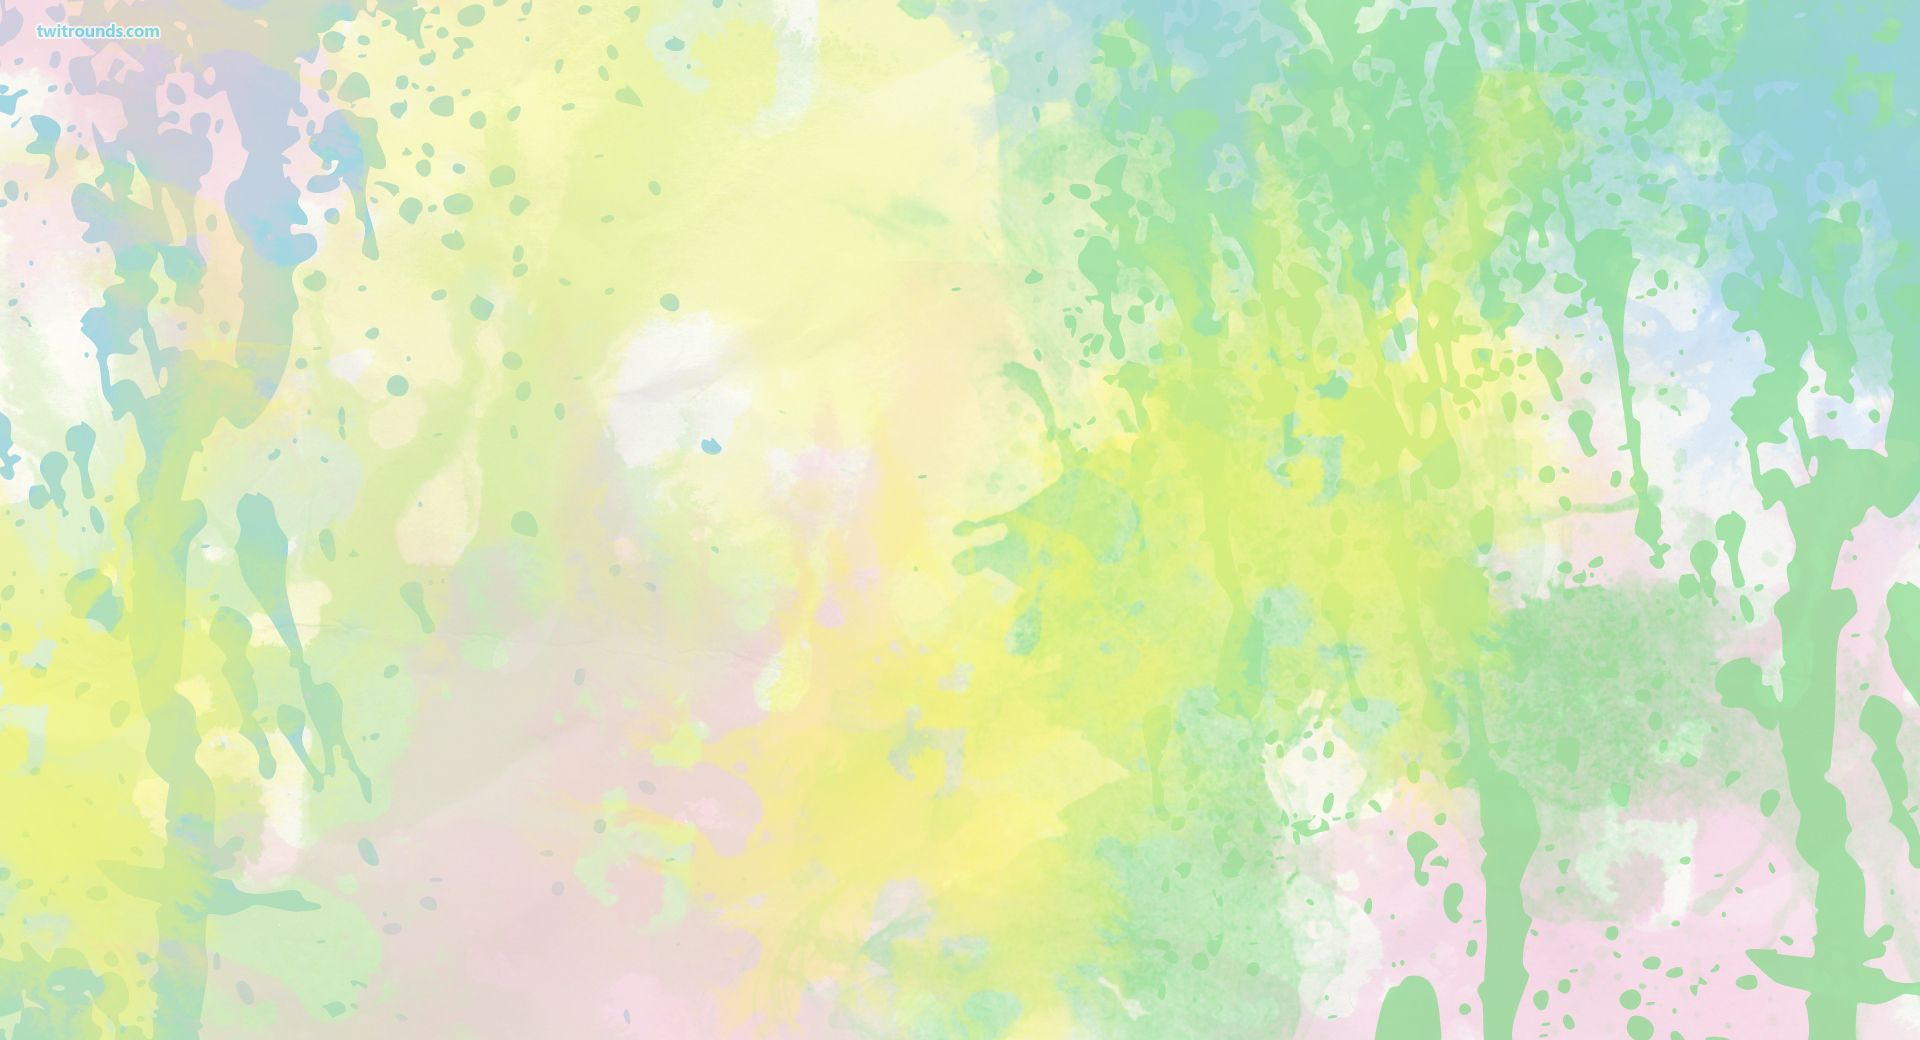 Desktop Wallpaper Abstract Watercolor Free #3367 Wallpaper ...